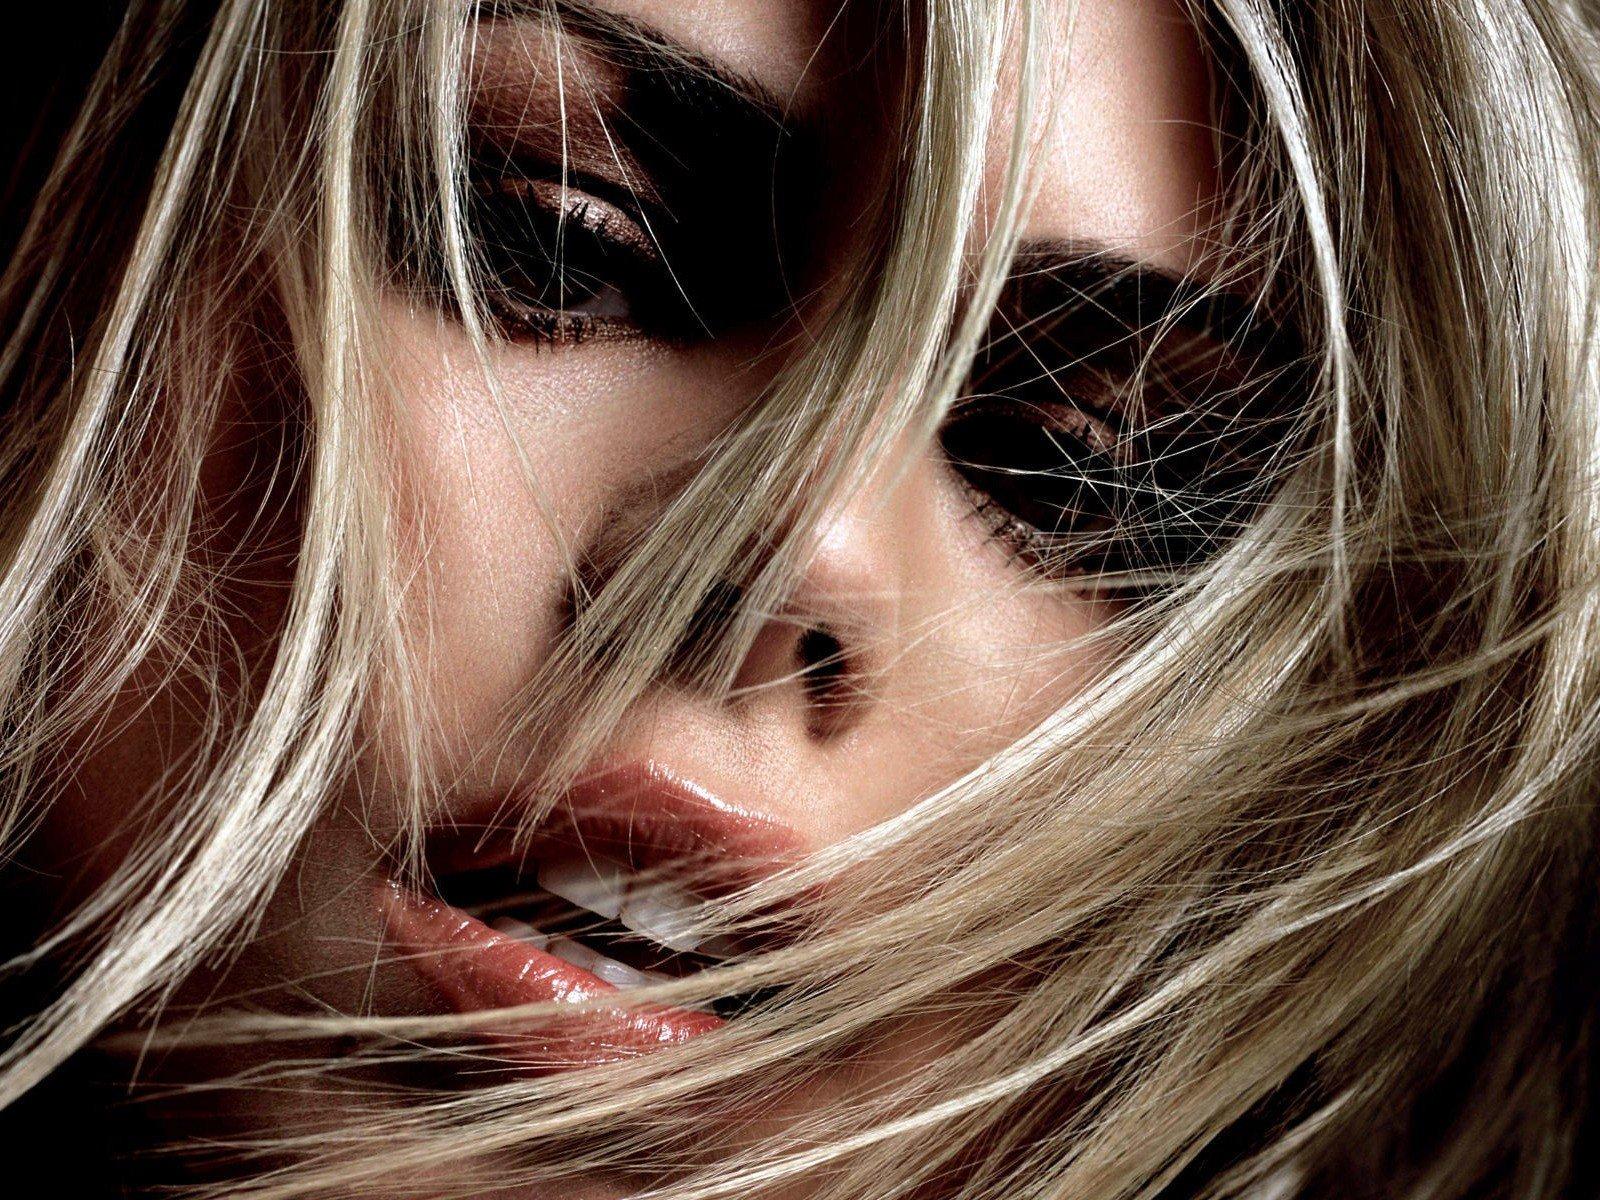 Billie Piper, Hair in face, Blonde, Face, Closeup Wallpaper